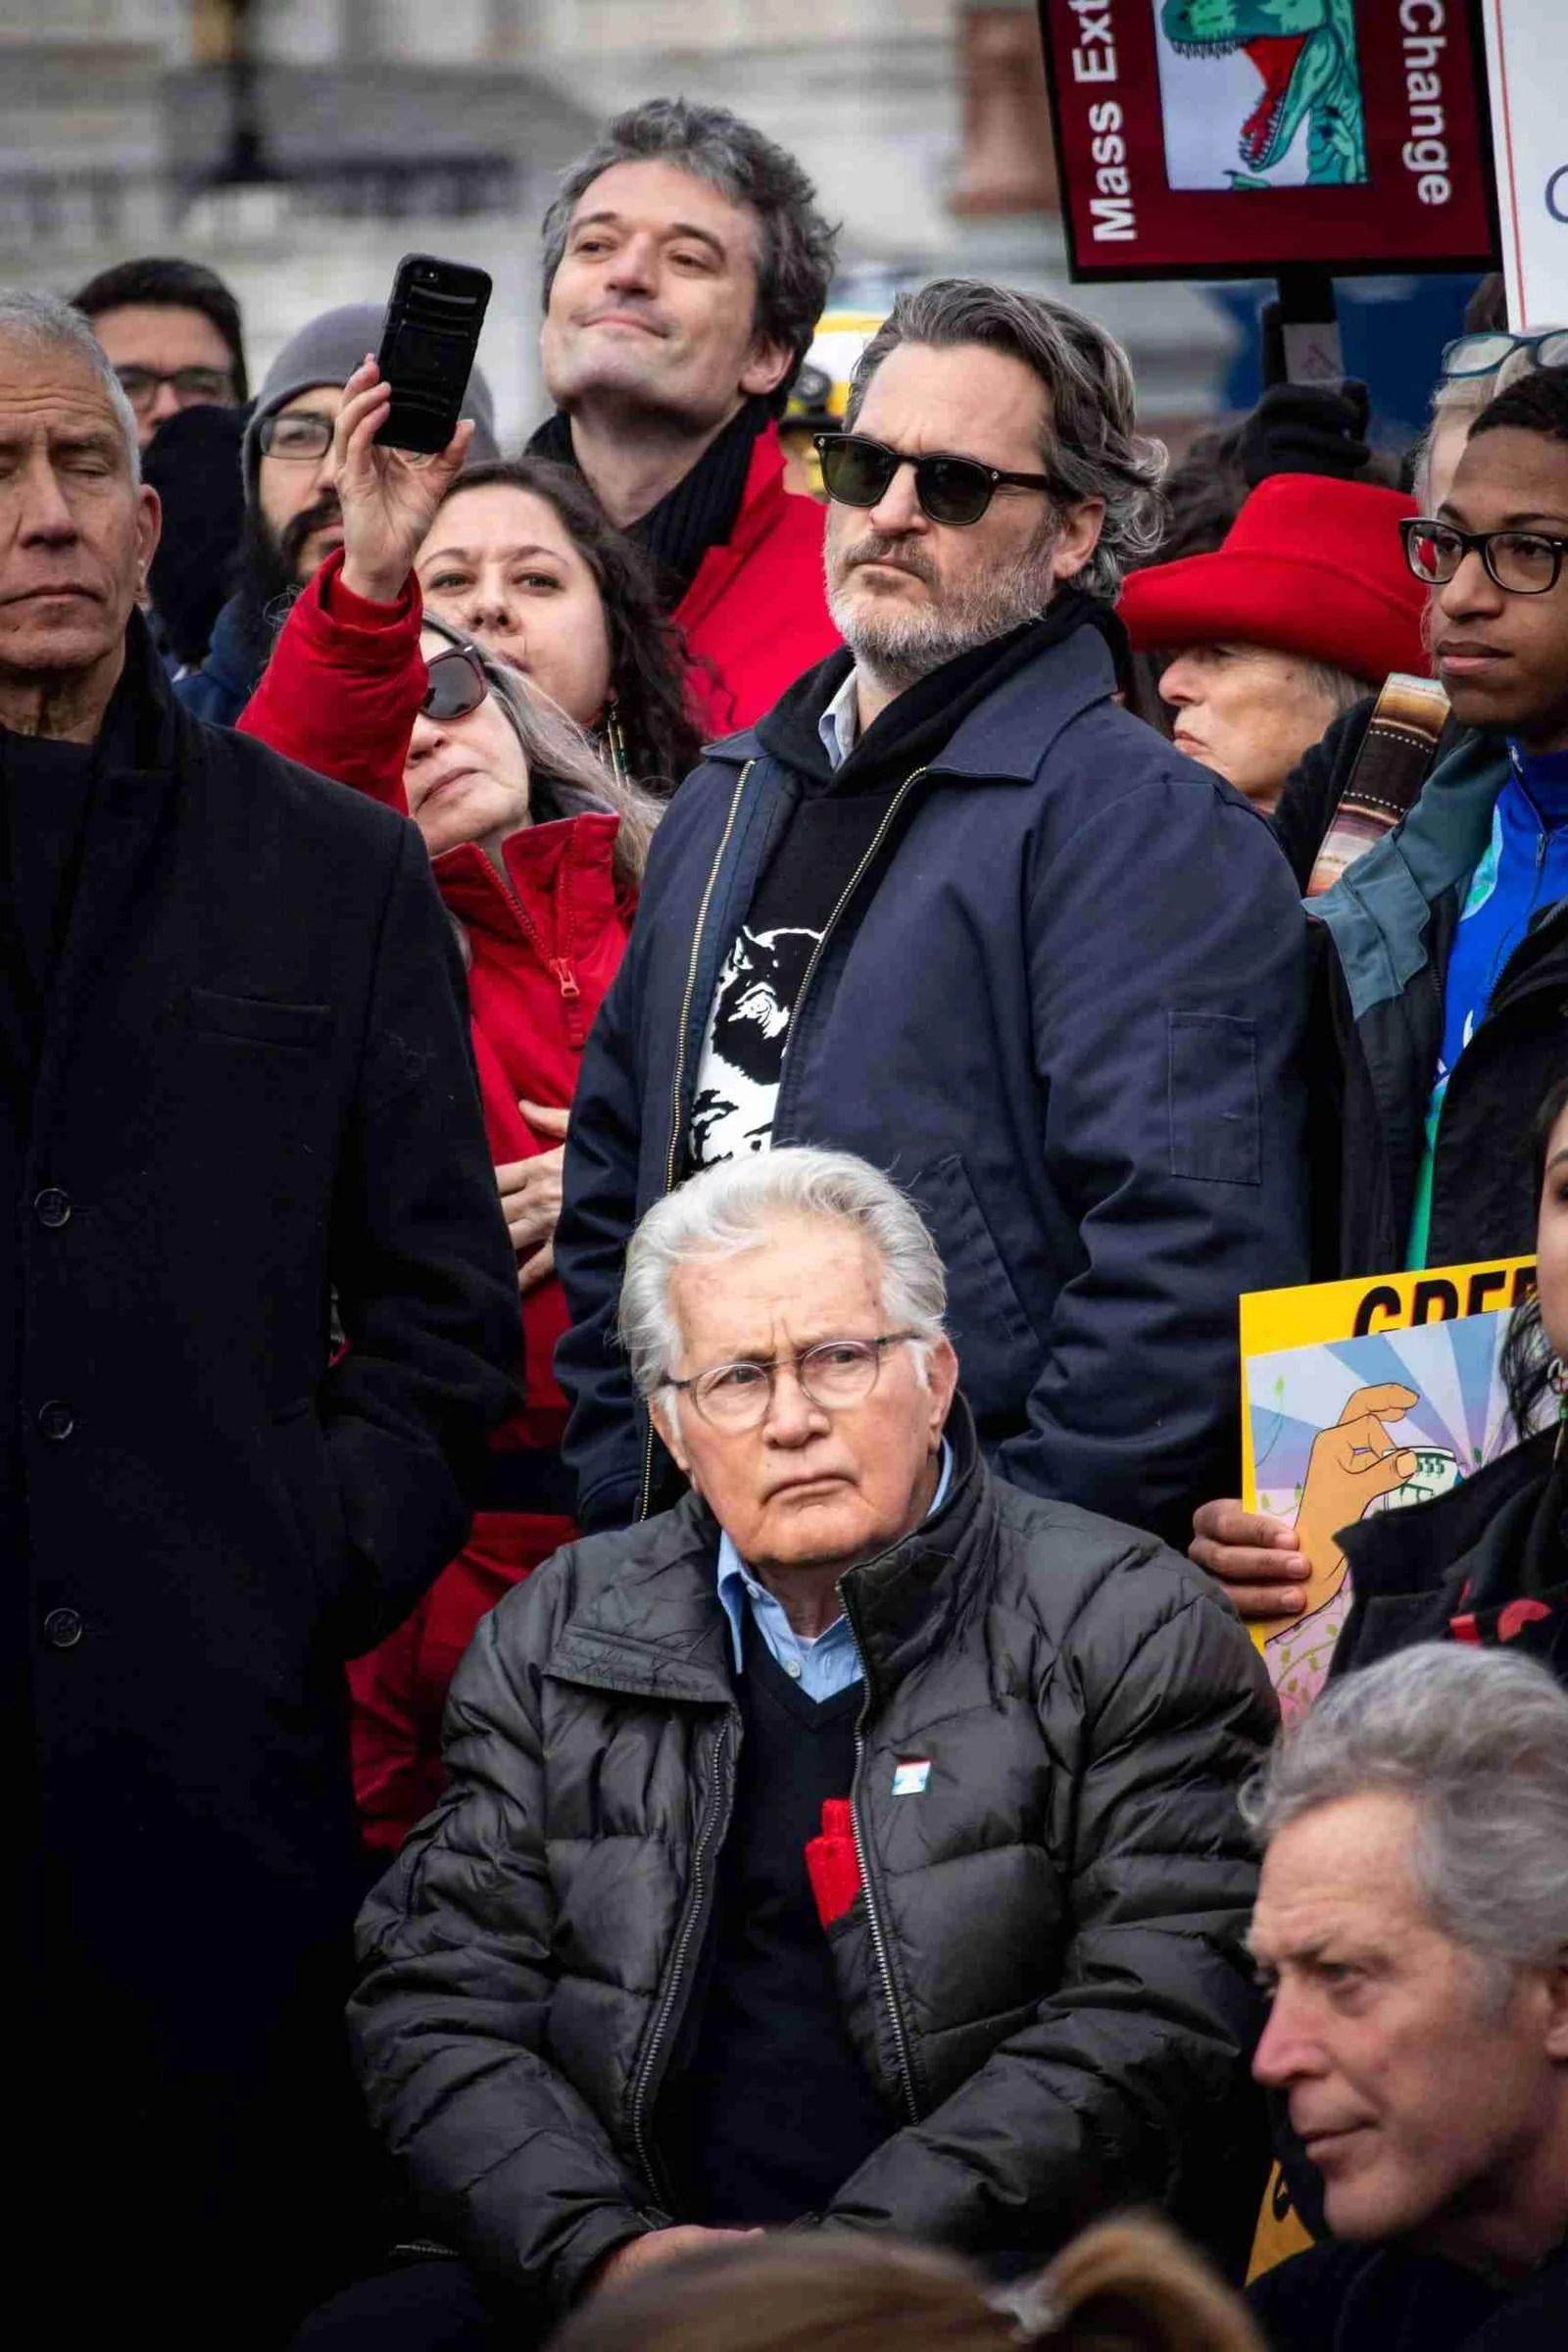 Joaquin Phoenix & Martin Sheen Arrested at Jane Fonda's Climate Change Rally 7